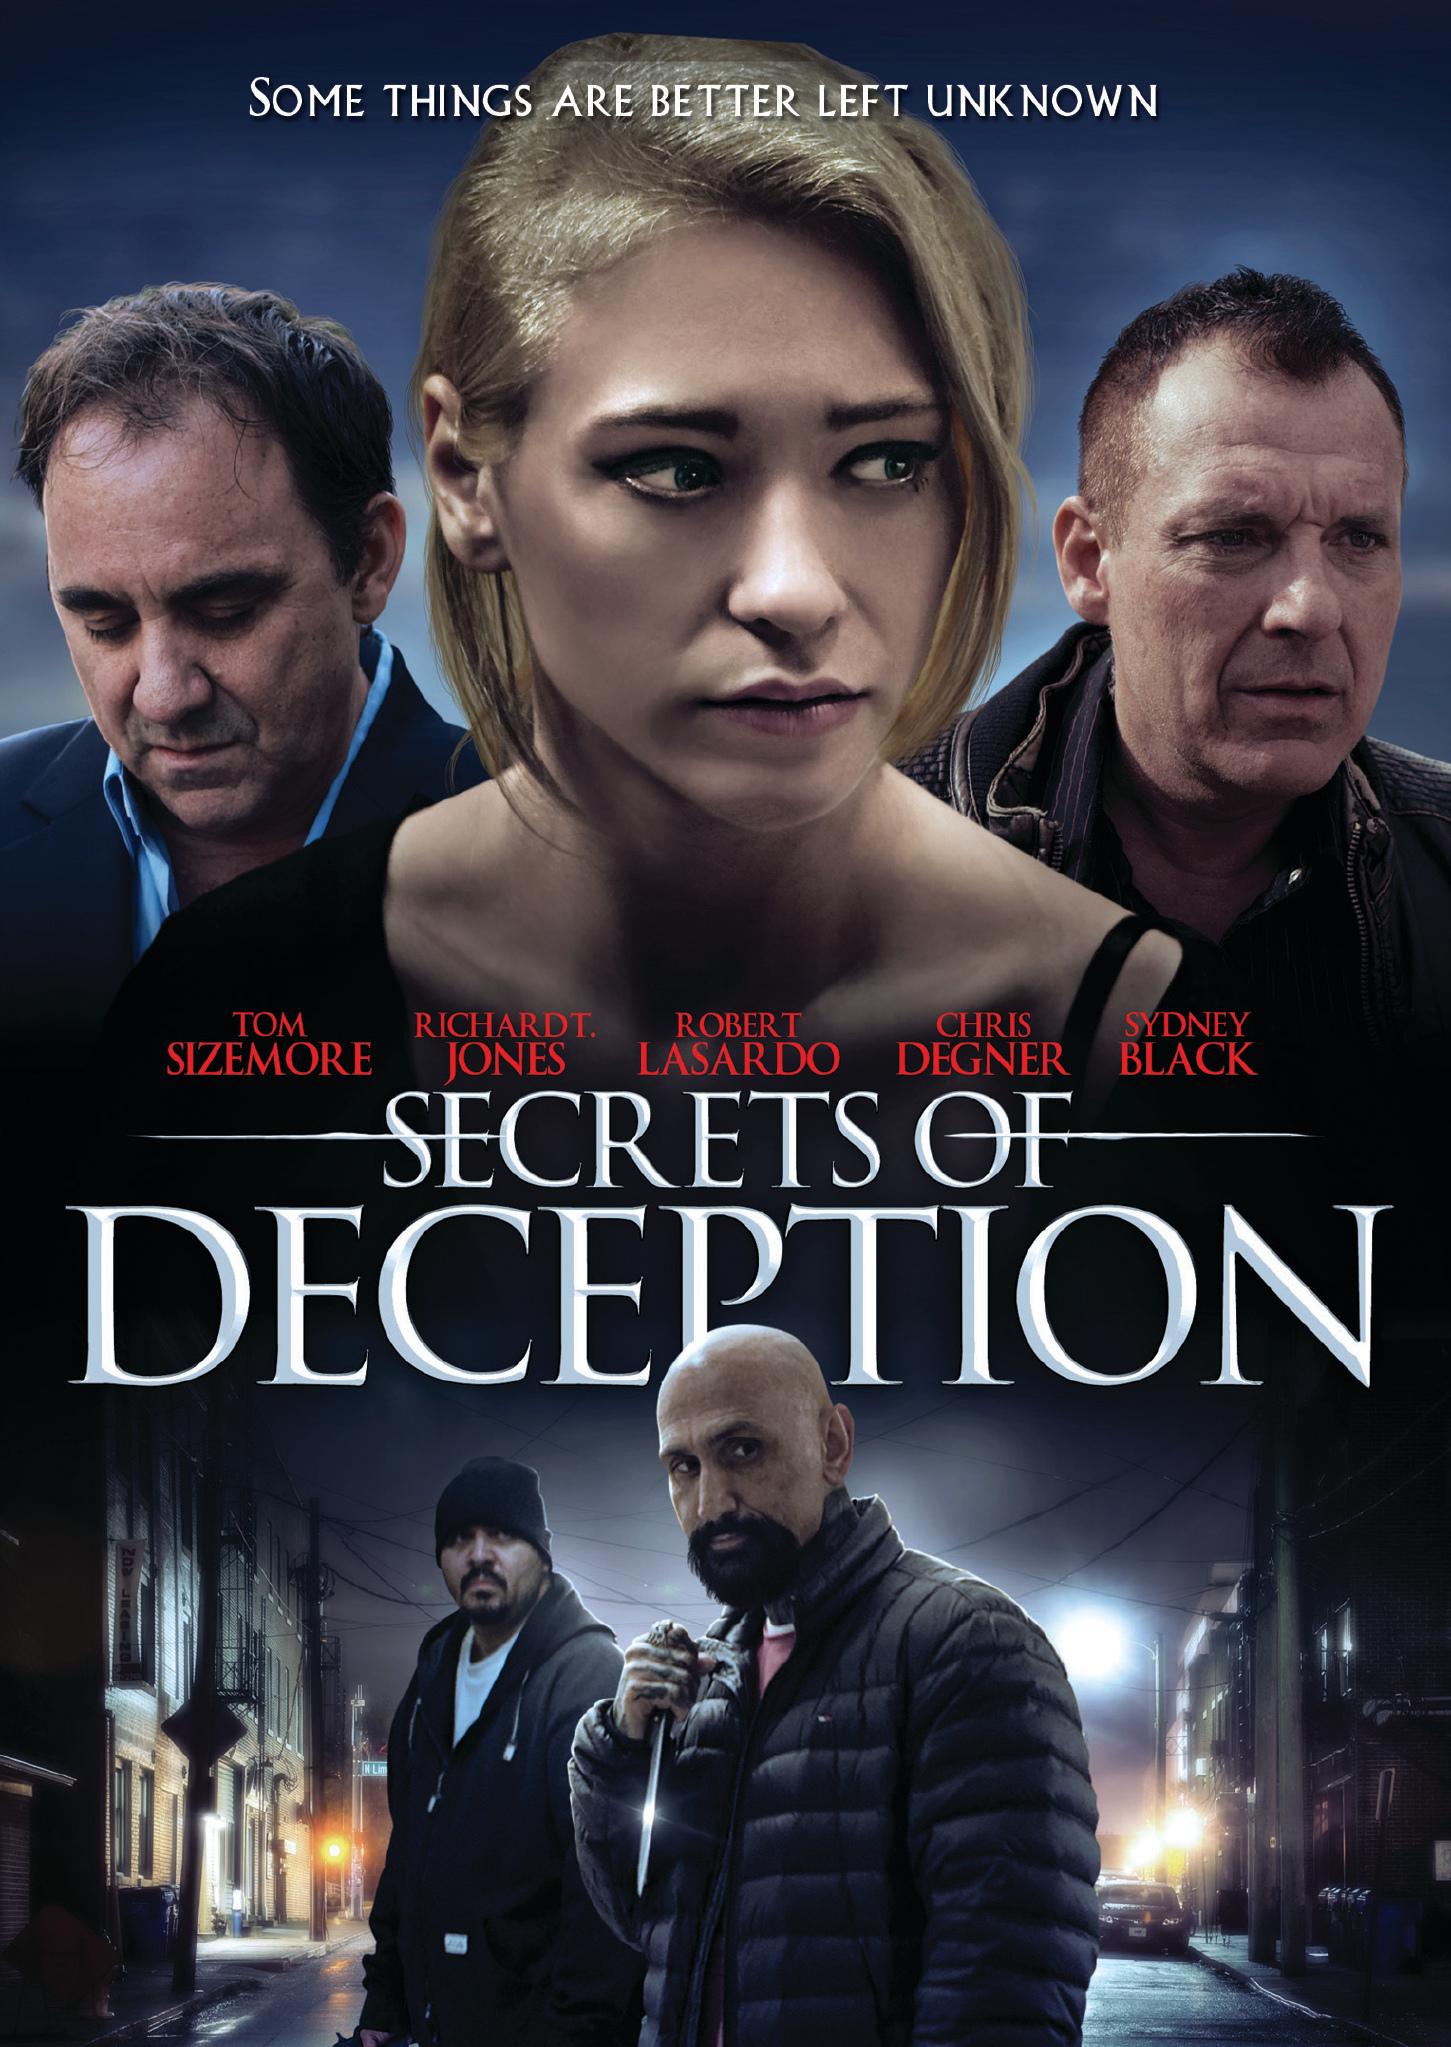 Secrets of Deception full movie streaming